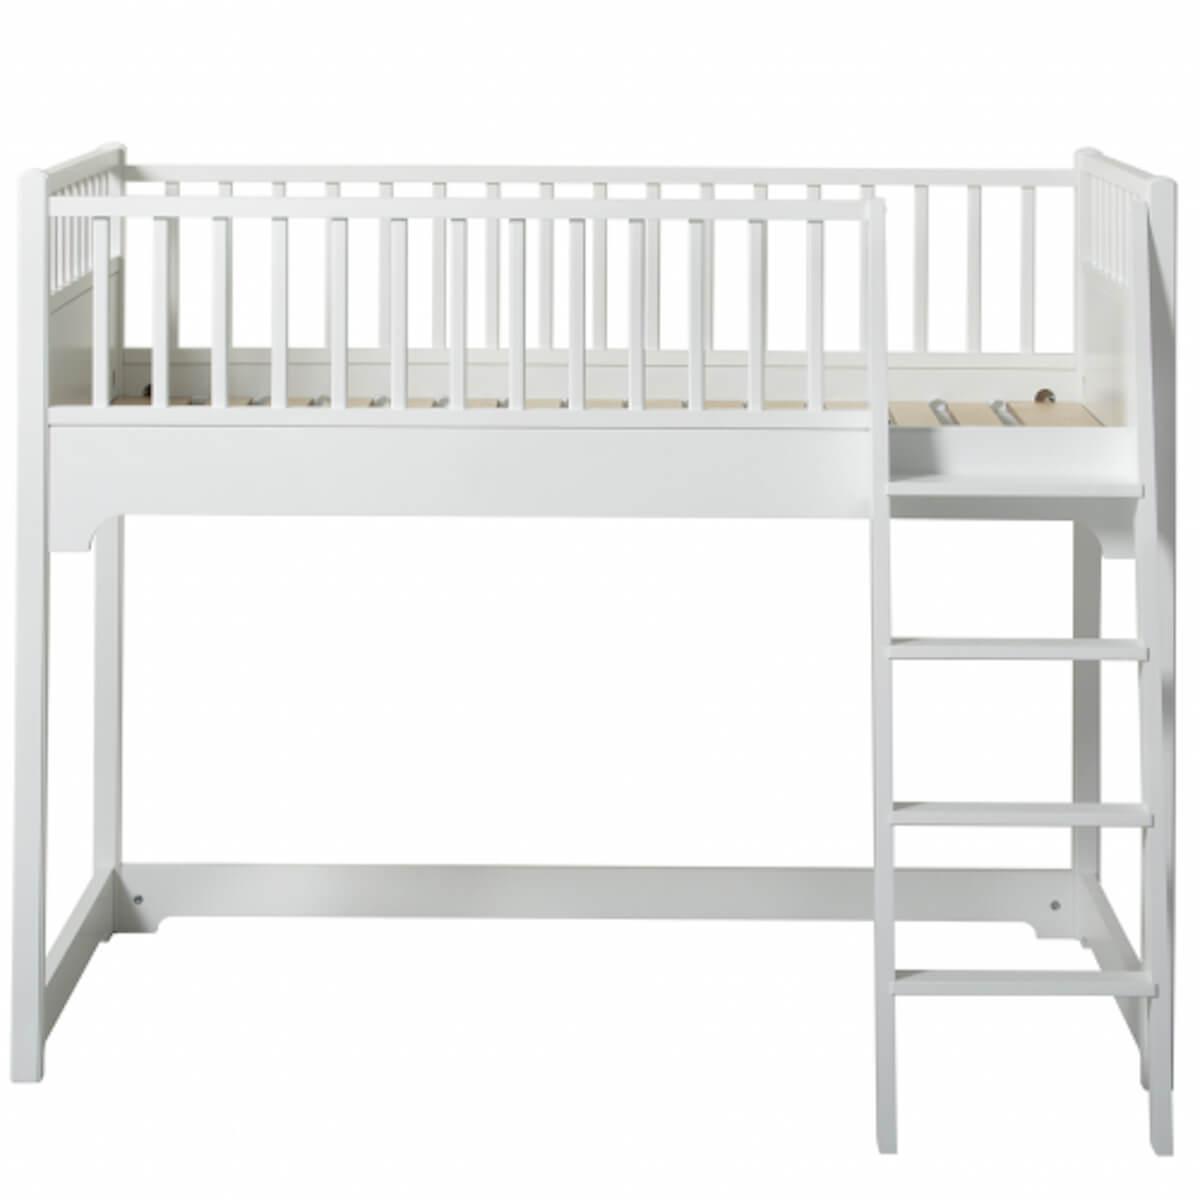 Halbhohes Bett junior 90x160cm SEASIDE CLASSIC Oliver Furniture Weiß